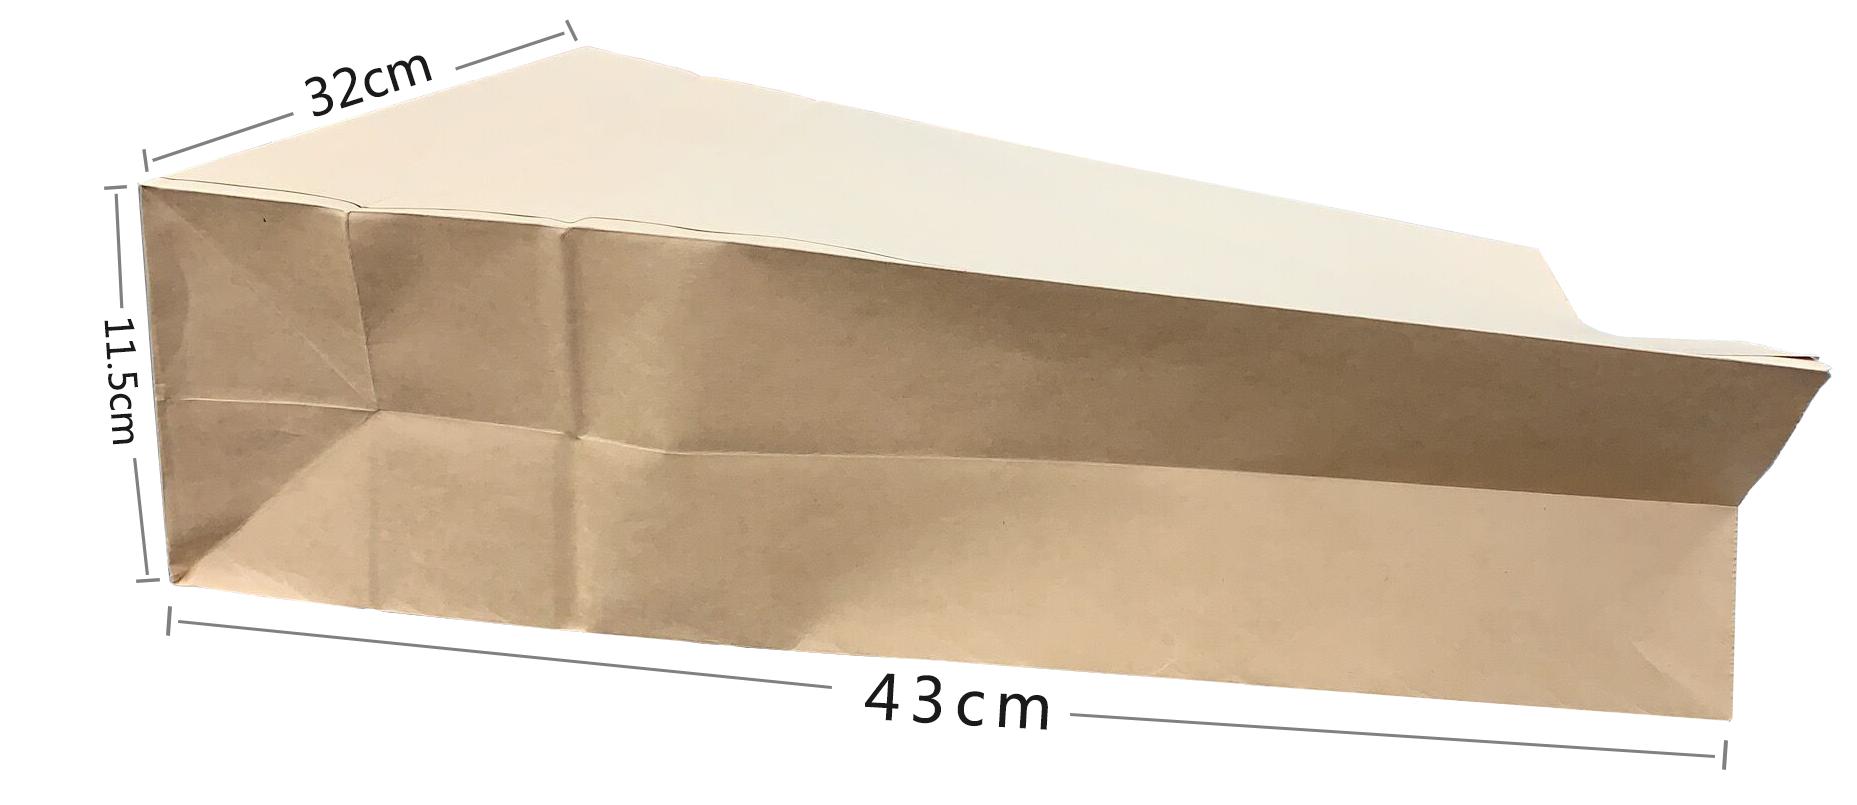 纸袋尺寸.png